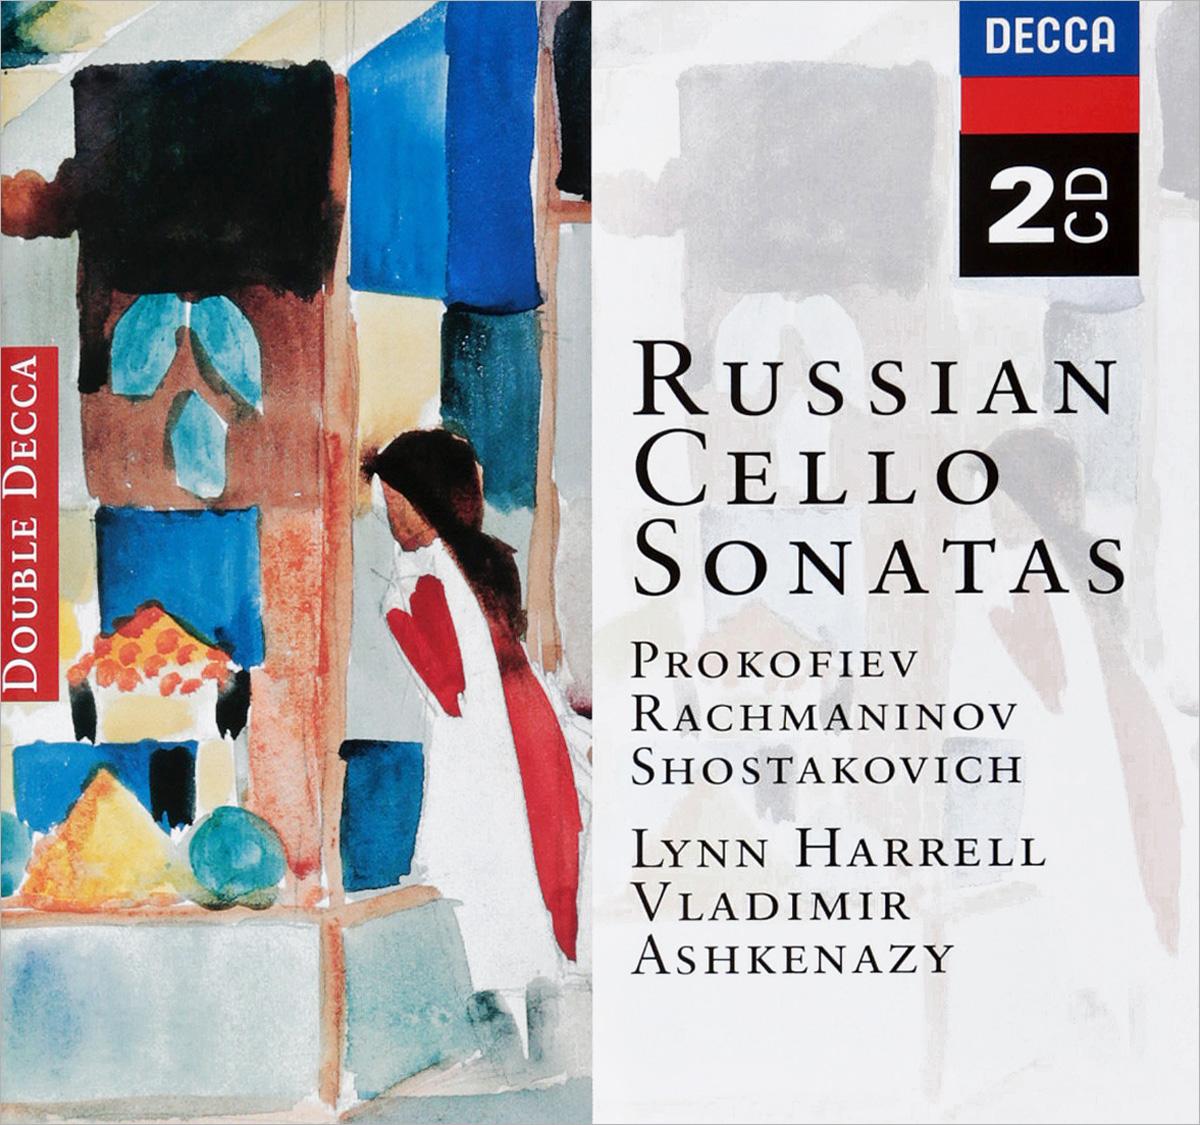 Владимир Ашкенази Vladimir Ashkenazy. Prokofiev/ Rachmaninov/ Shostakovich: Russian Cello Sonatas (2 CD) yulianna avdeeva chopin schubert prokofiev 2 cd